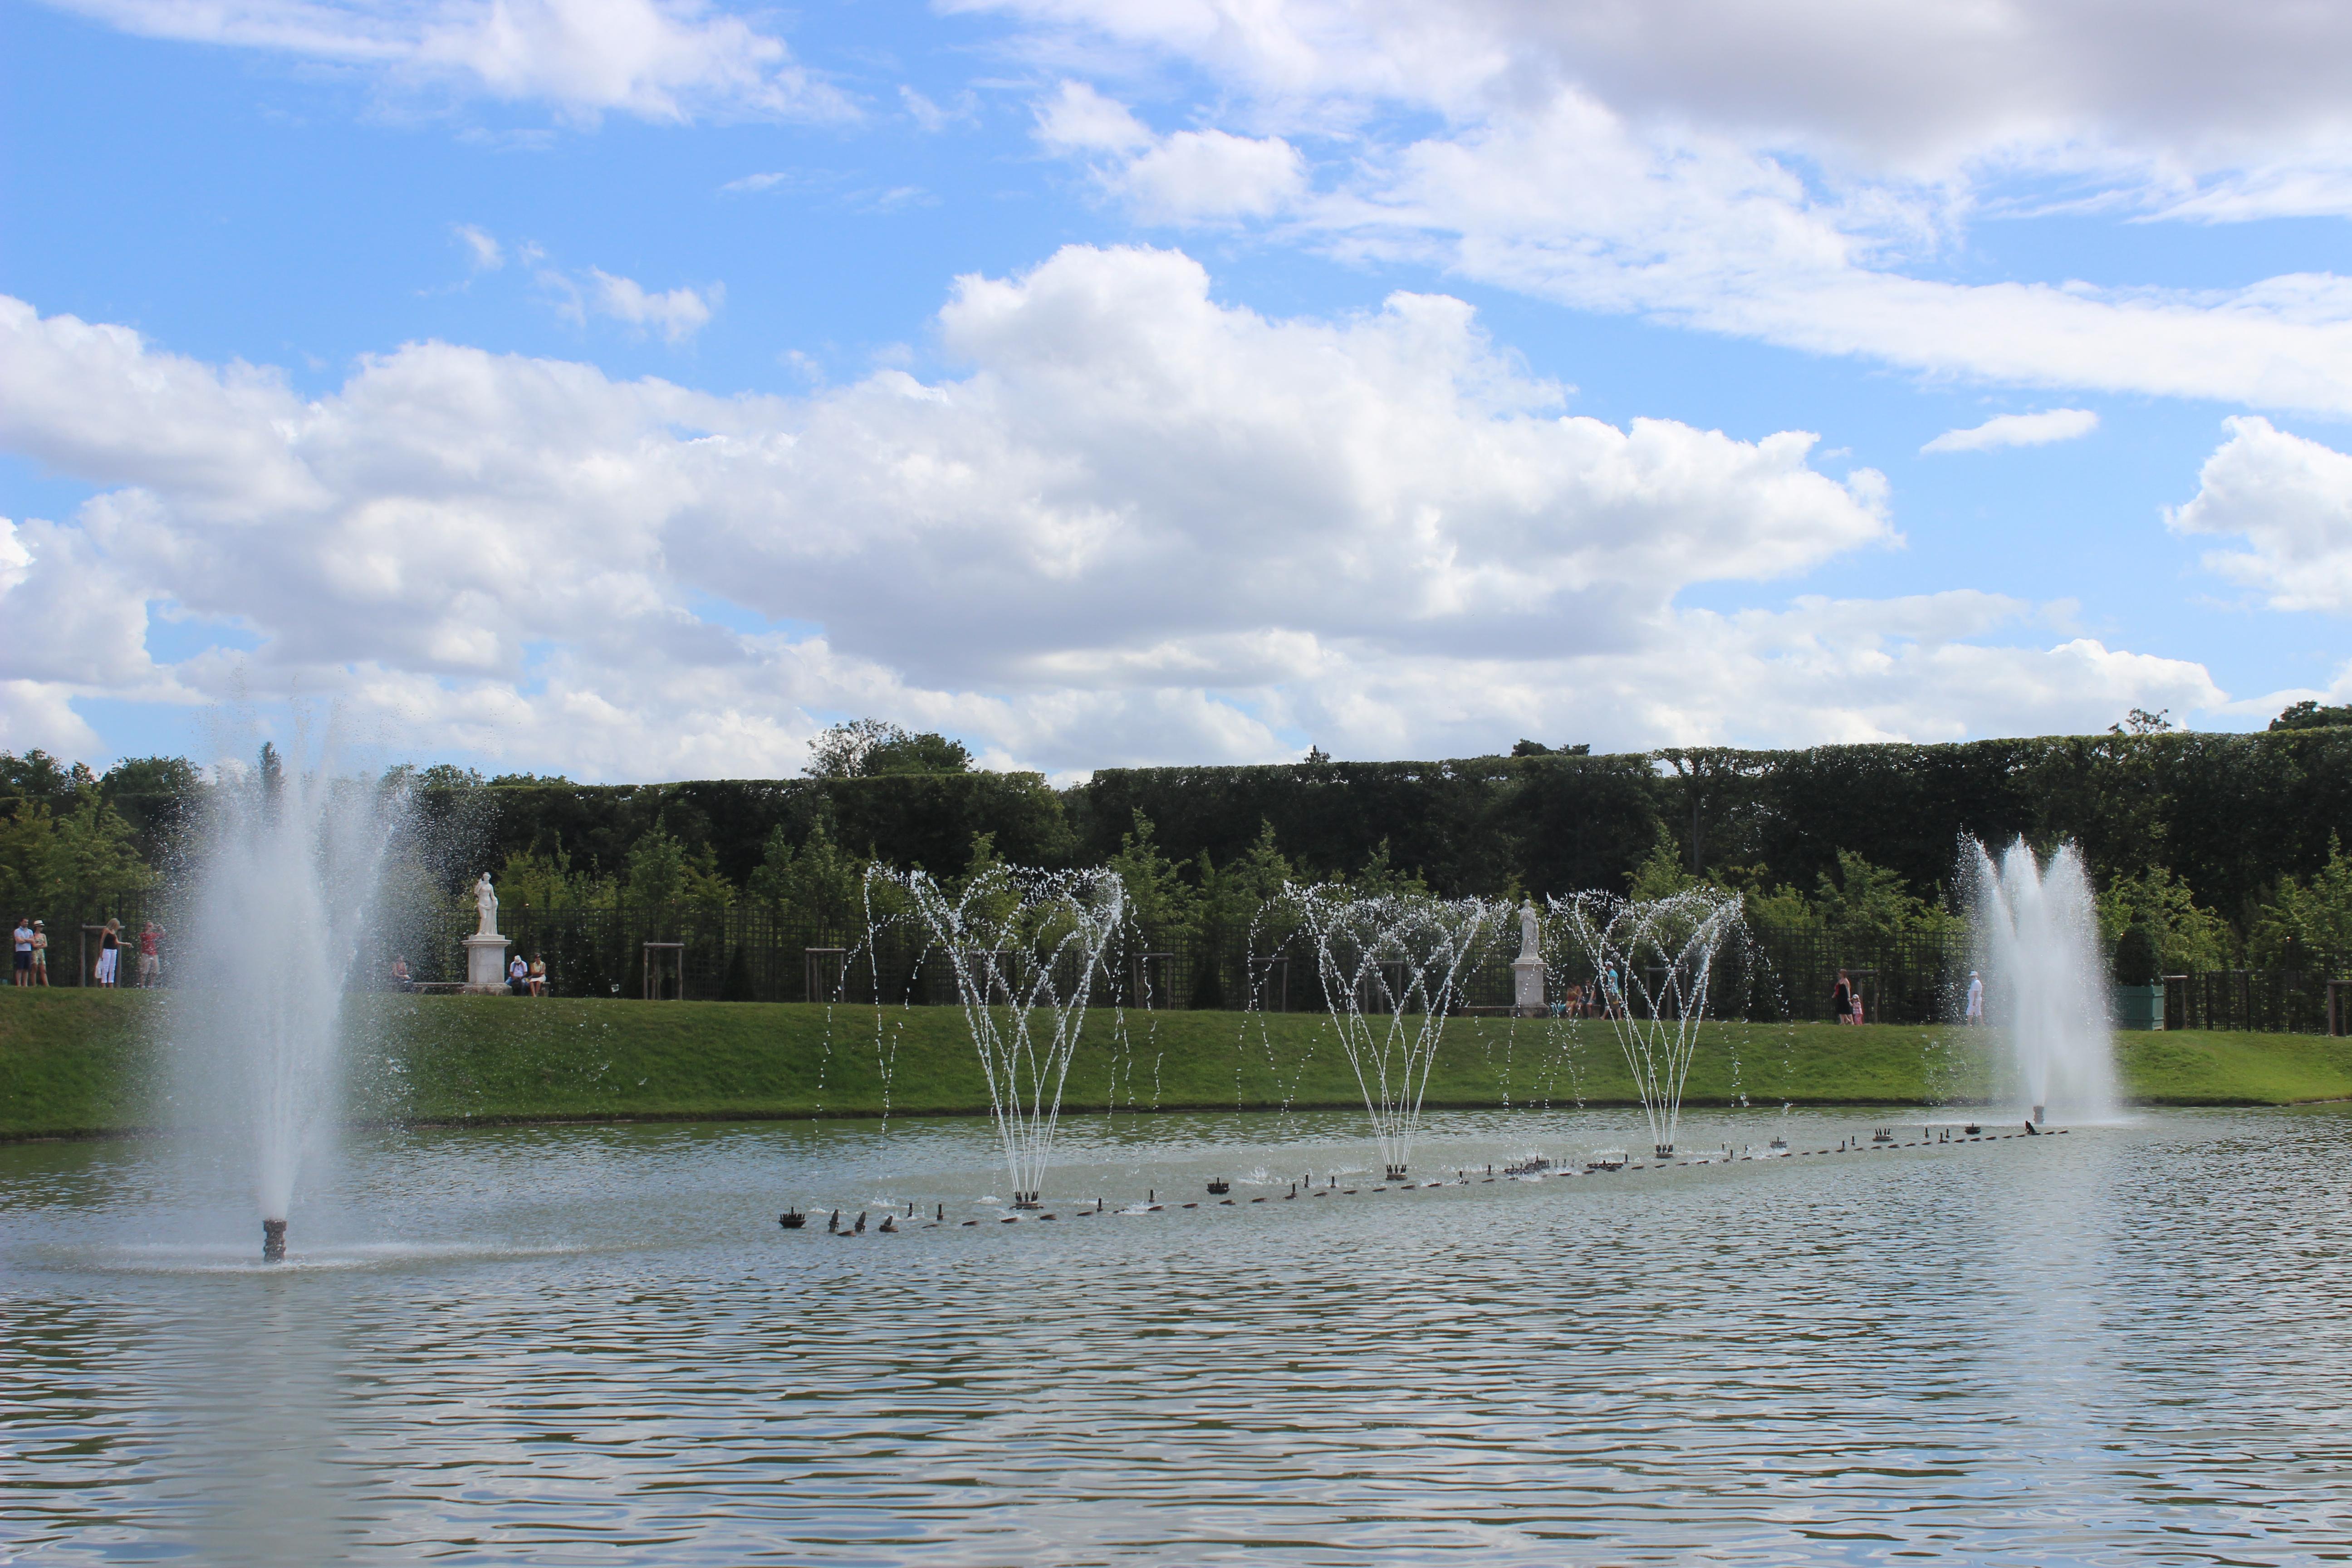 File bassin du miroir 2013 14 jpg wikimedia commons - Bassin effet miroir toulon ...